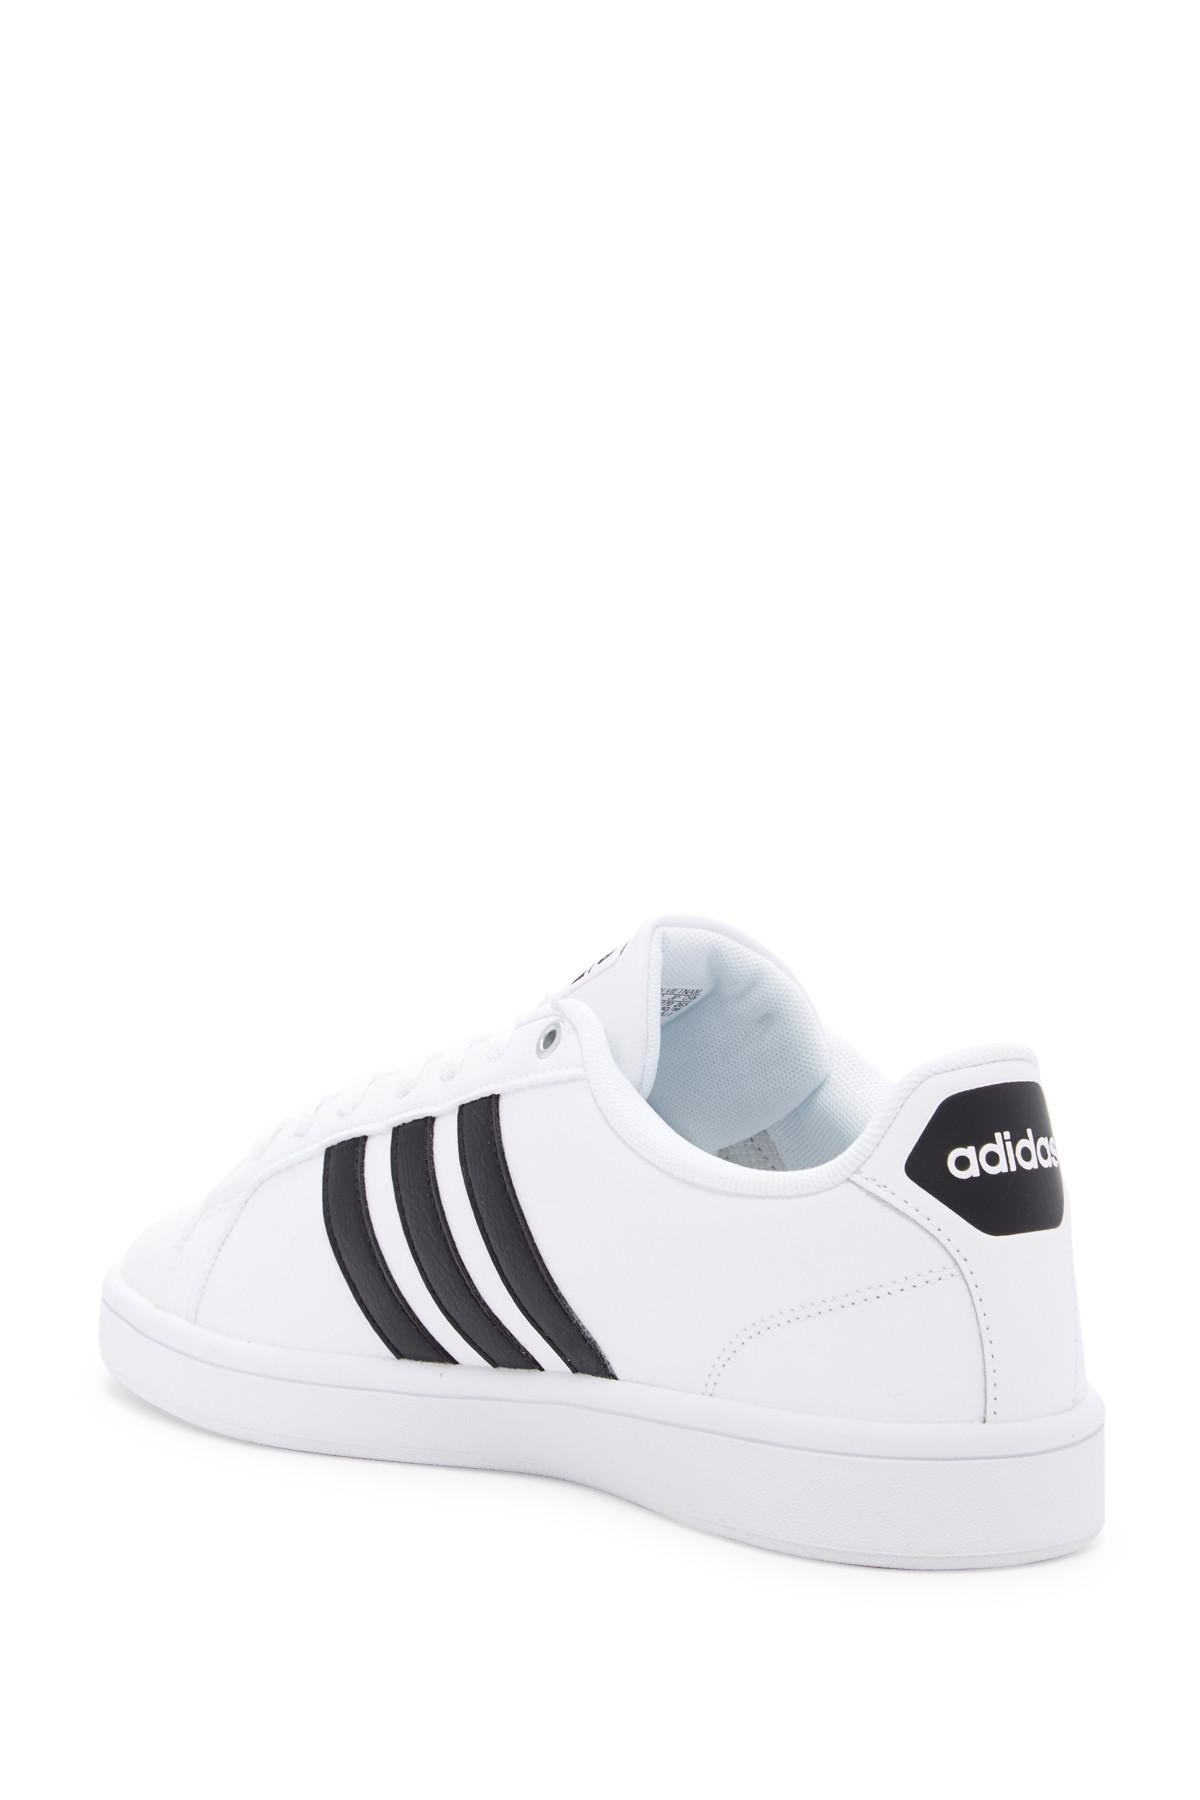 4aa47c27f Adidas - White Cloudfoam Advantage Sneaker for Men - Lyst. View fullscreen